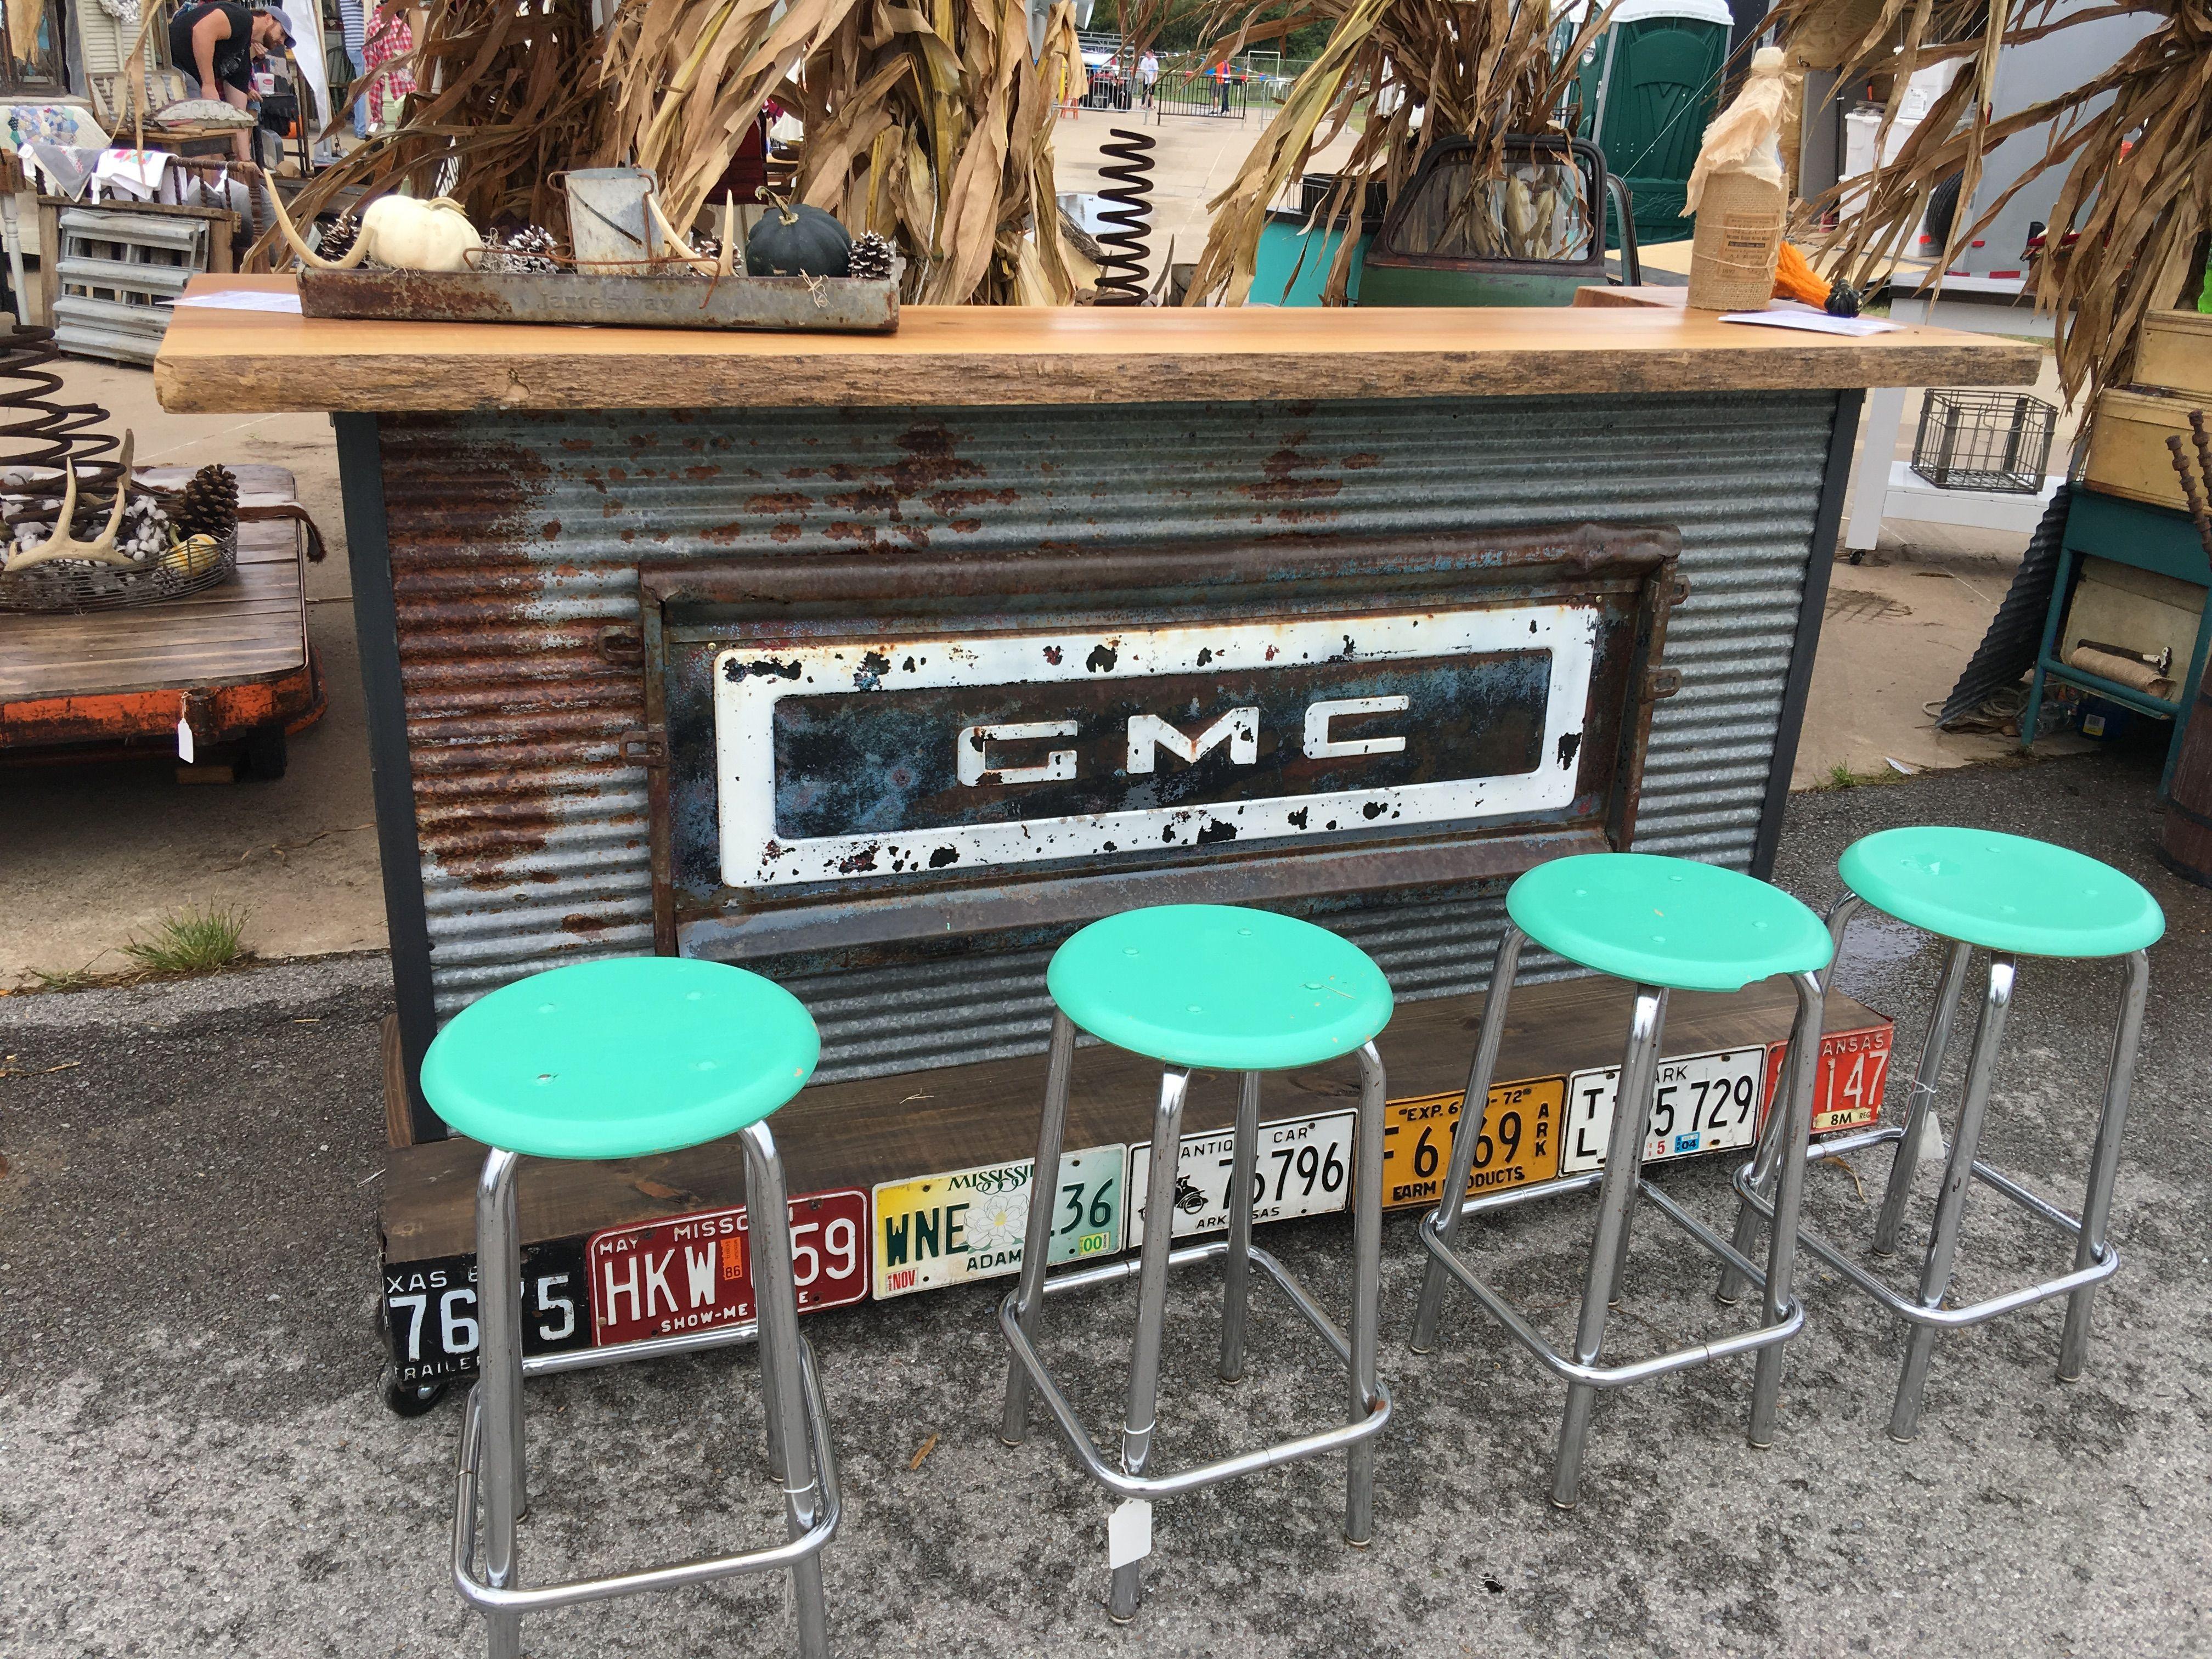 manzali hoppy stool automotive by stools modern high giorgio barstoolhoppy bonaldo stardust bar barstool counter